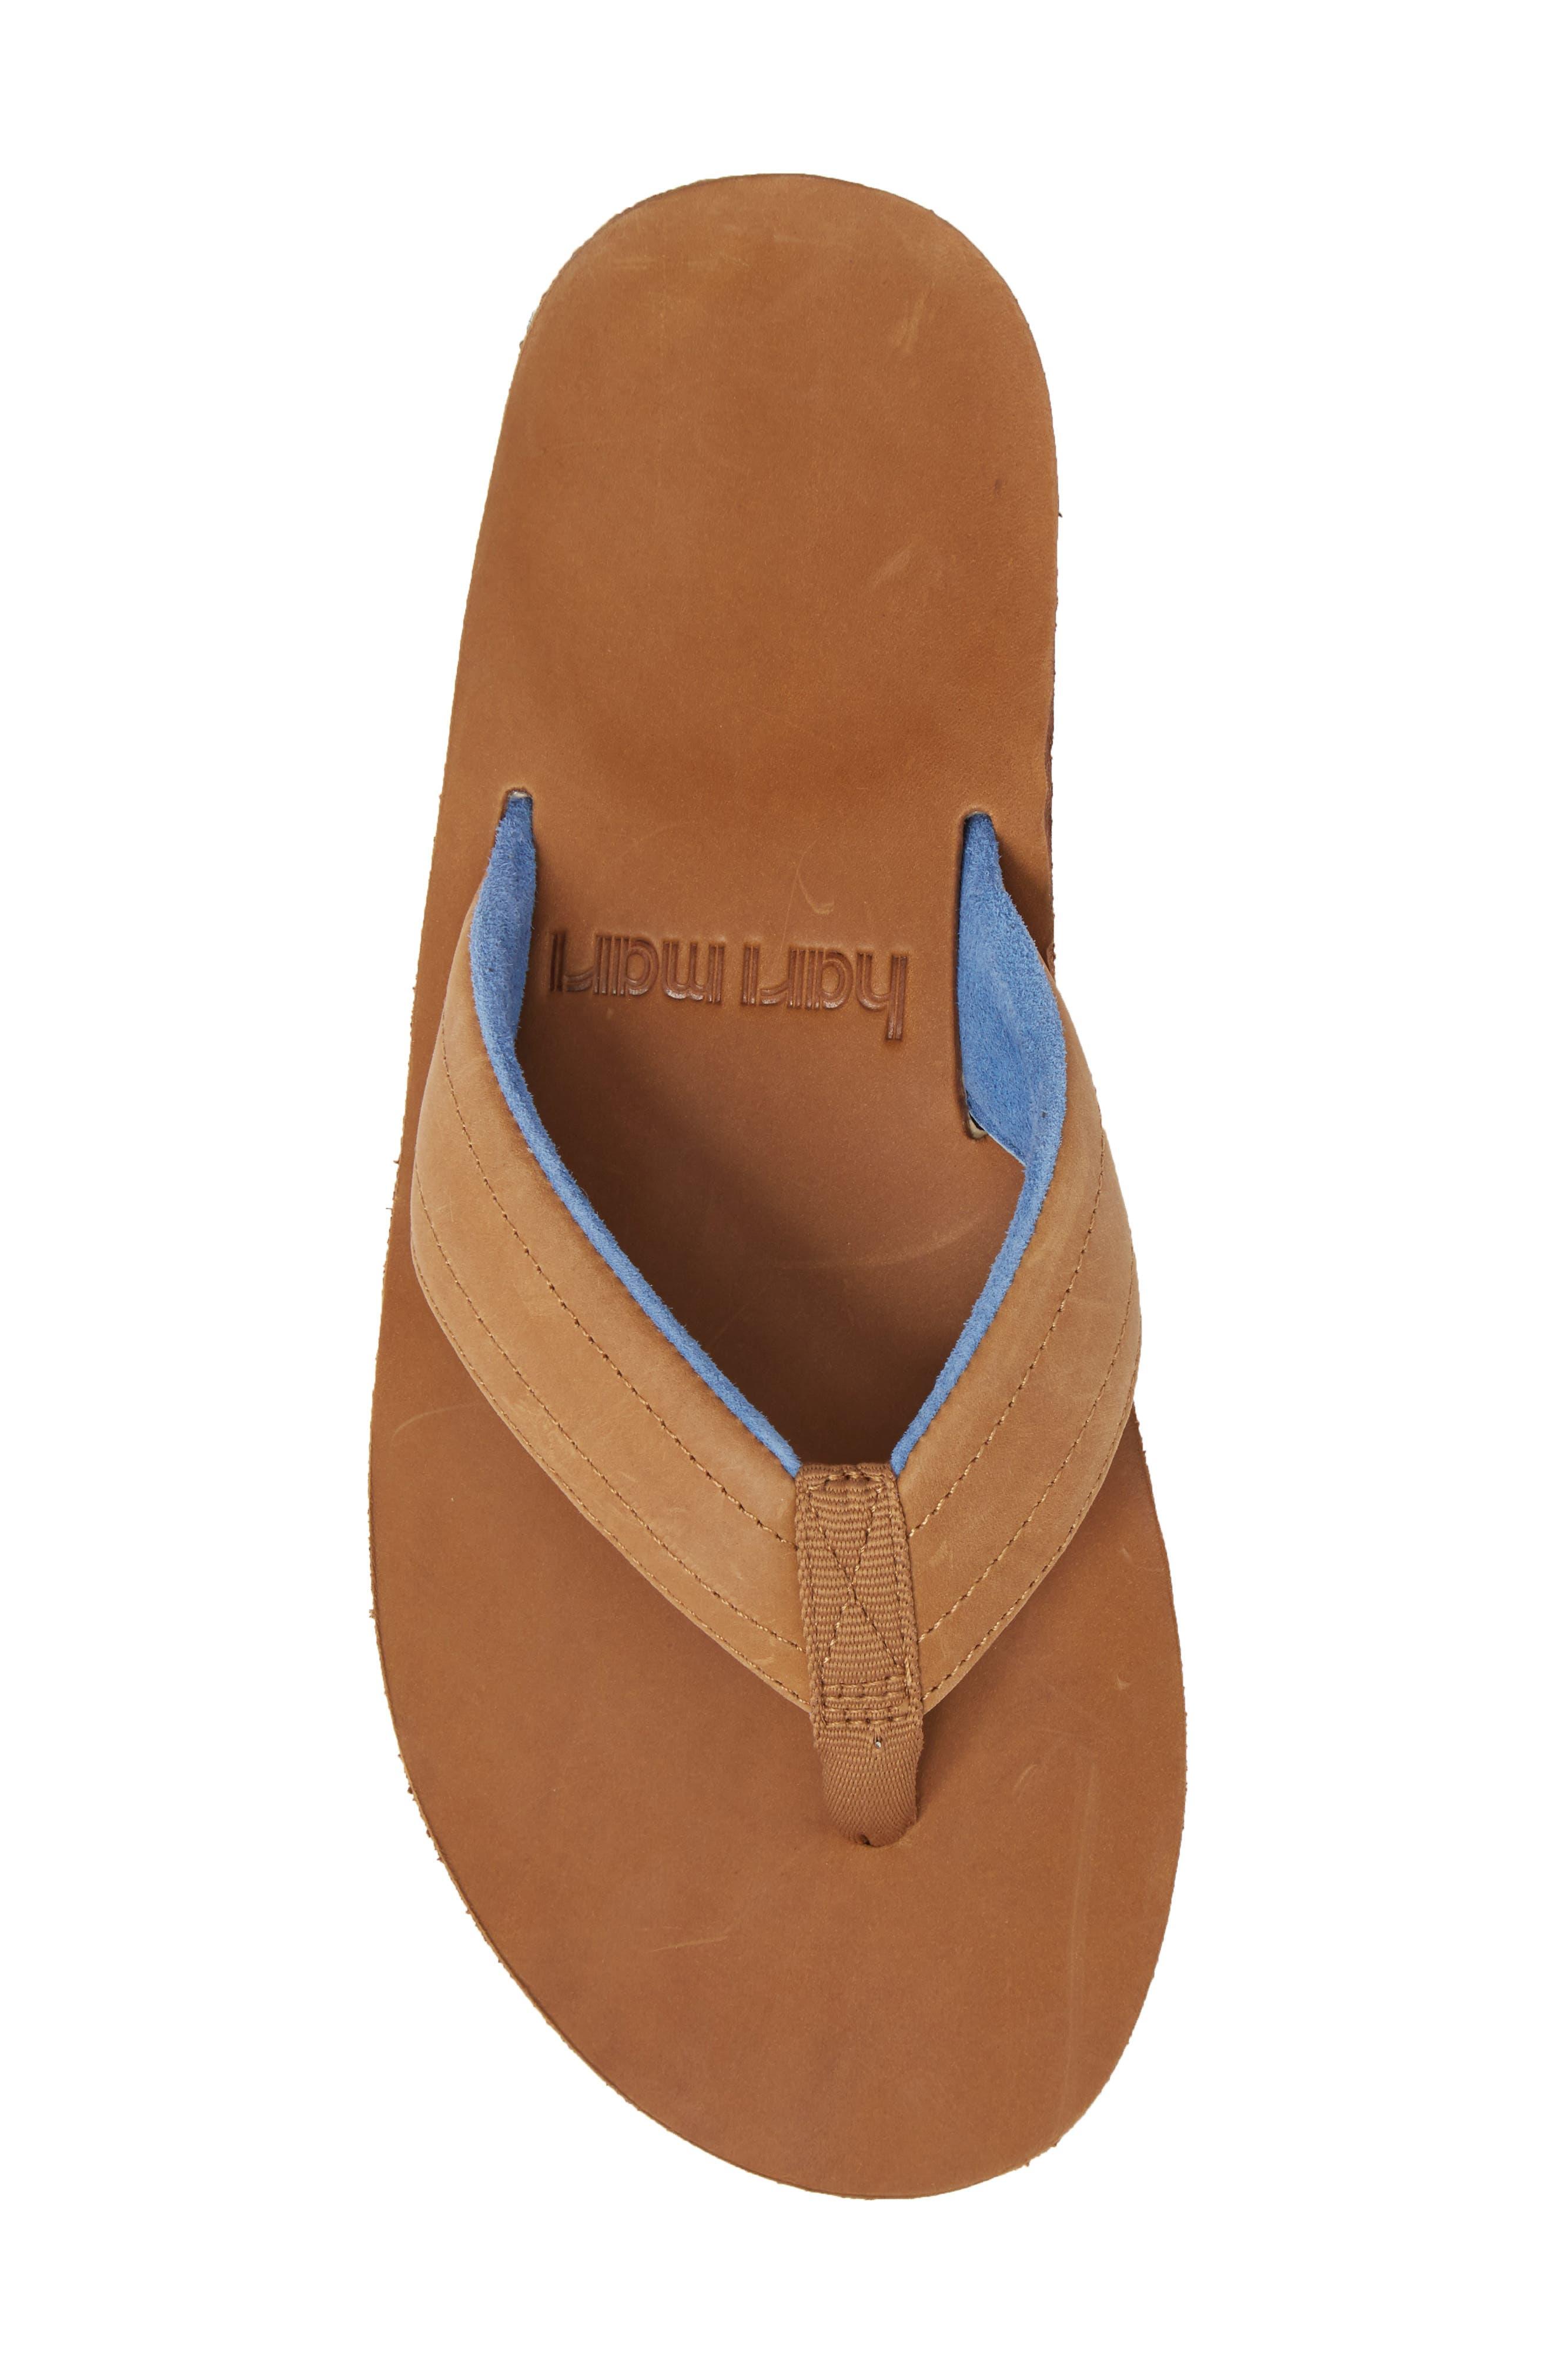 Lakes Sandwich Stripe Flip Flop,                             Alternate thumbnail 5, color,                             Tan/ Navy Leather